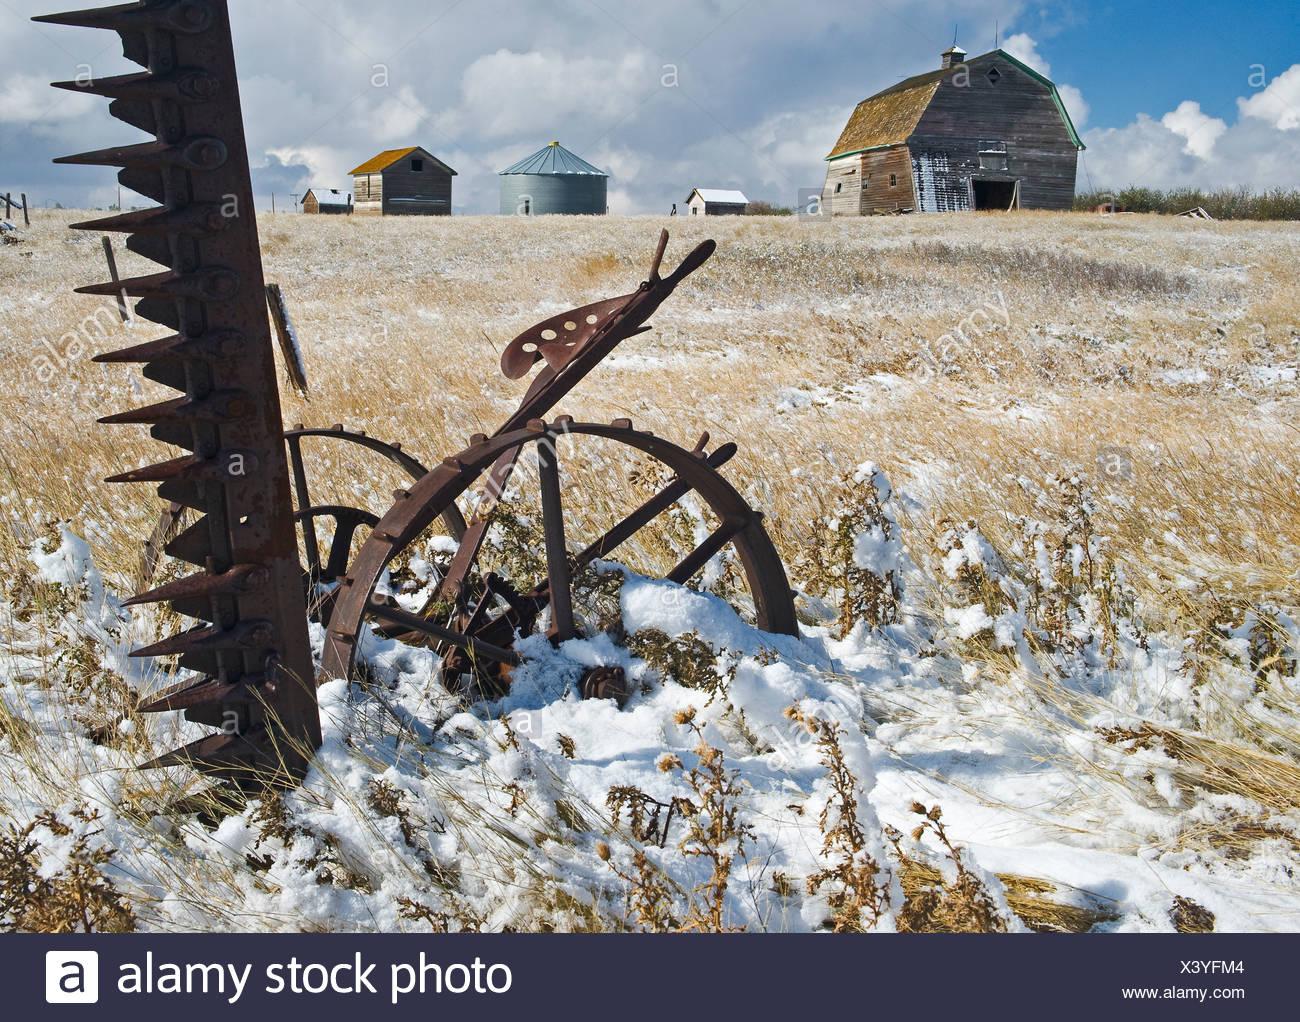 Sickle Farming Stock Photos & Sickle Farming Stock Images